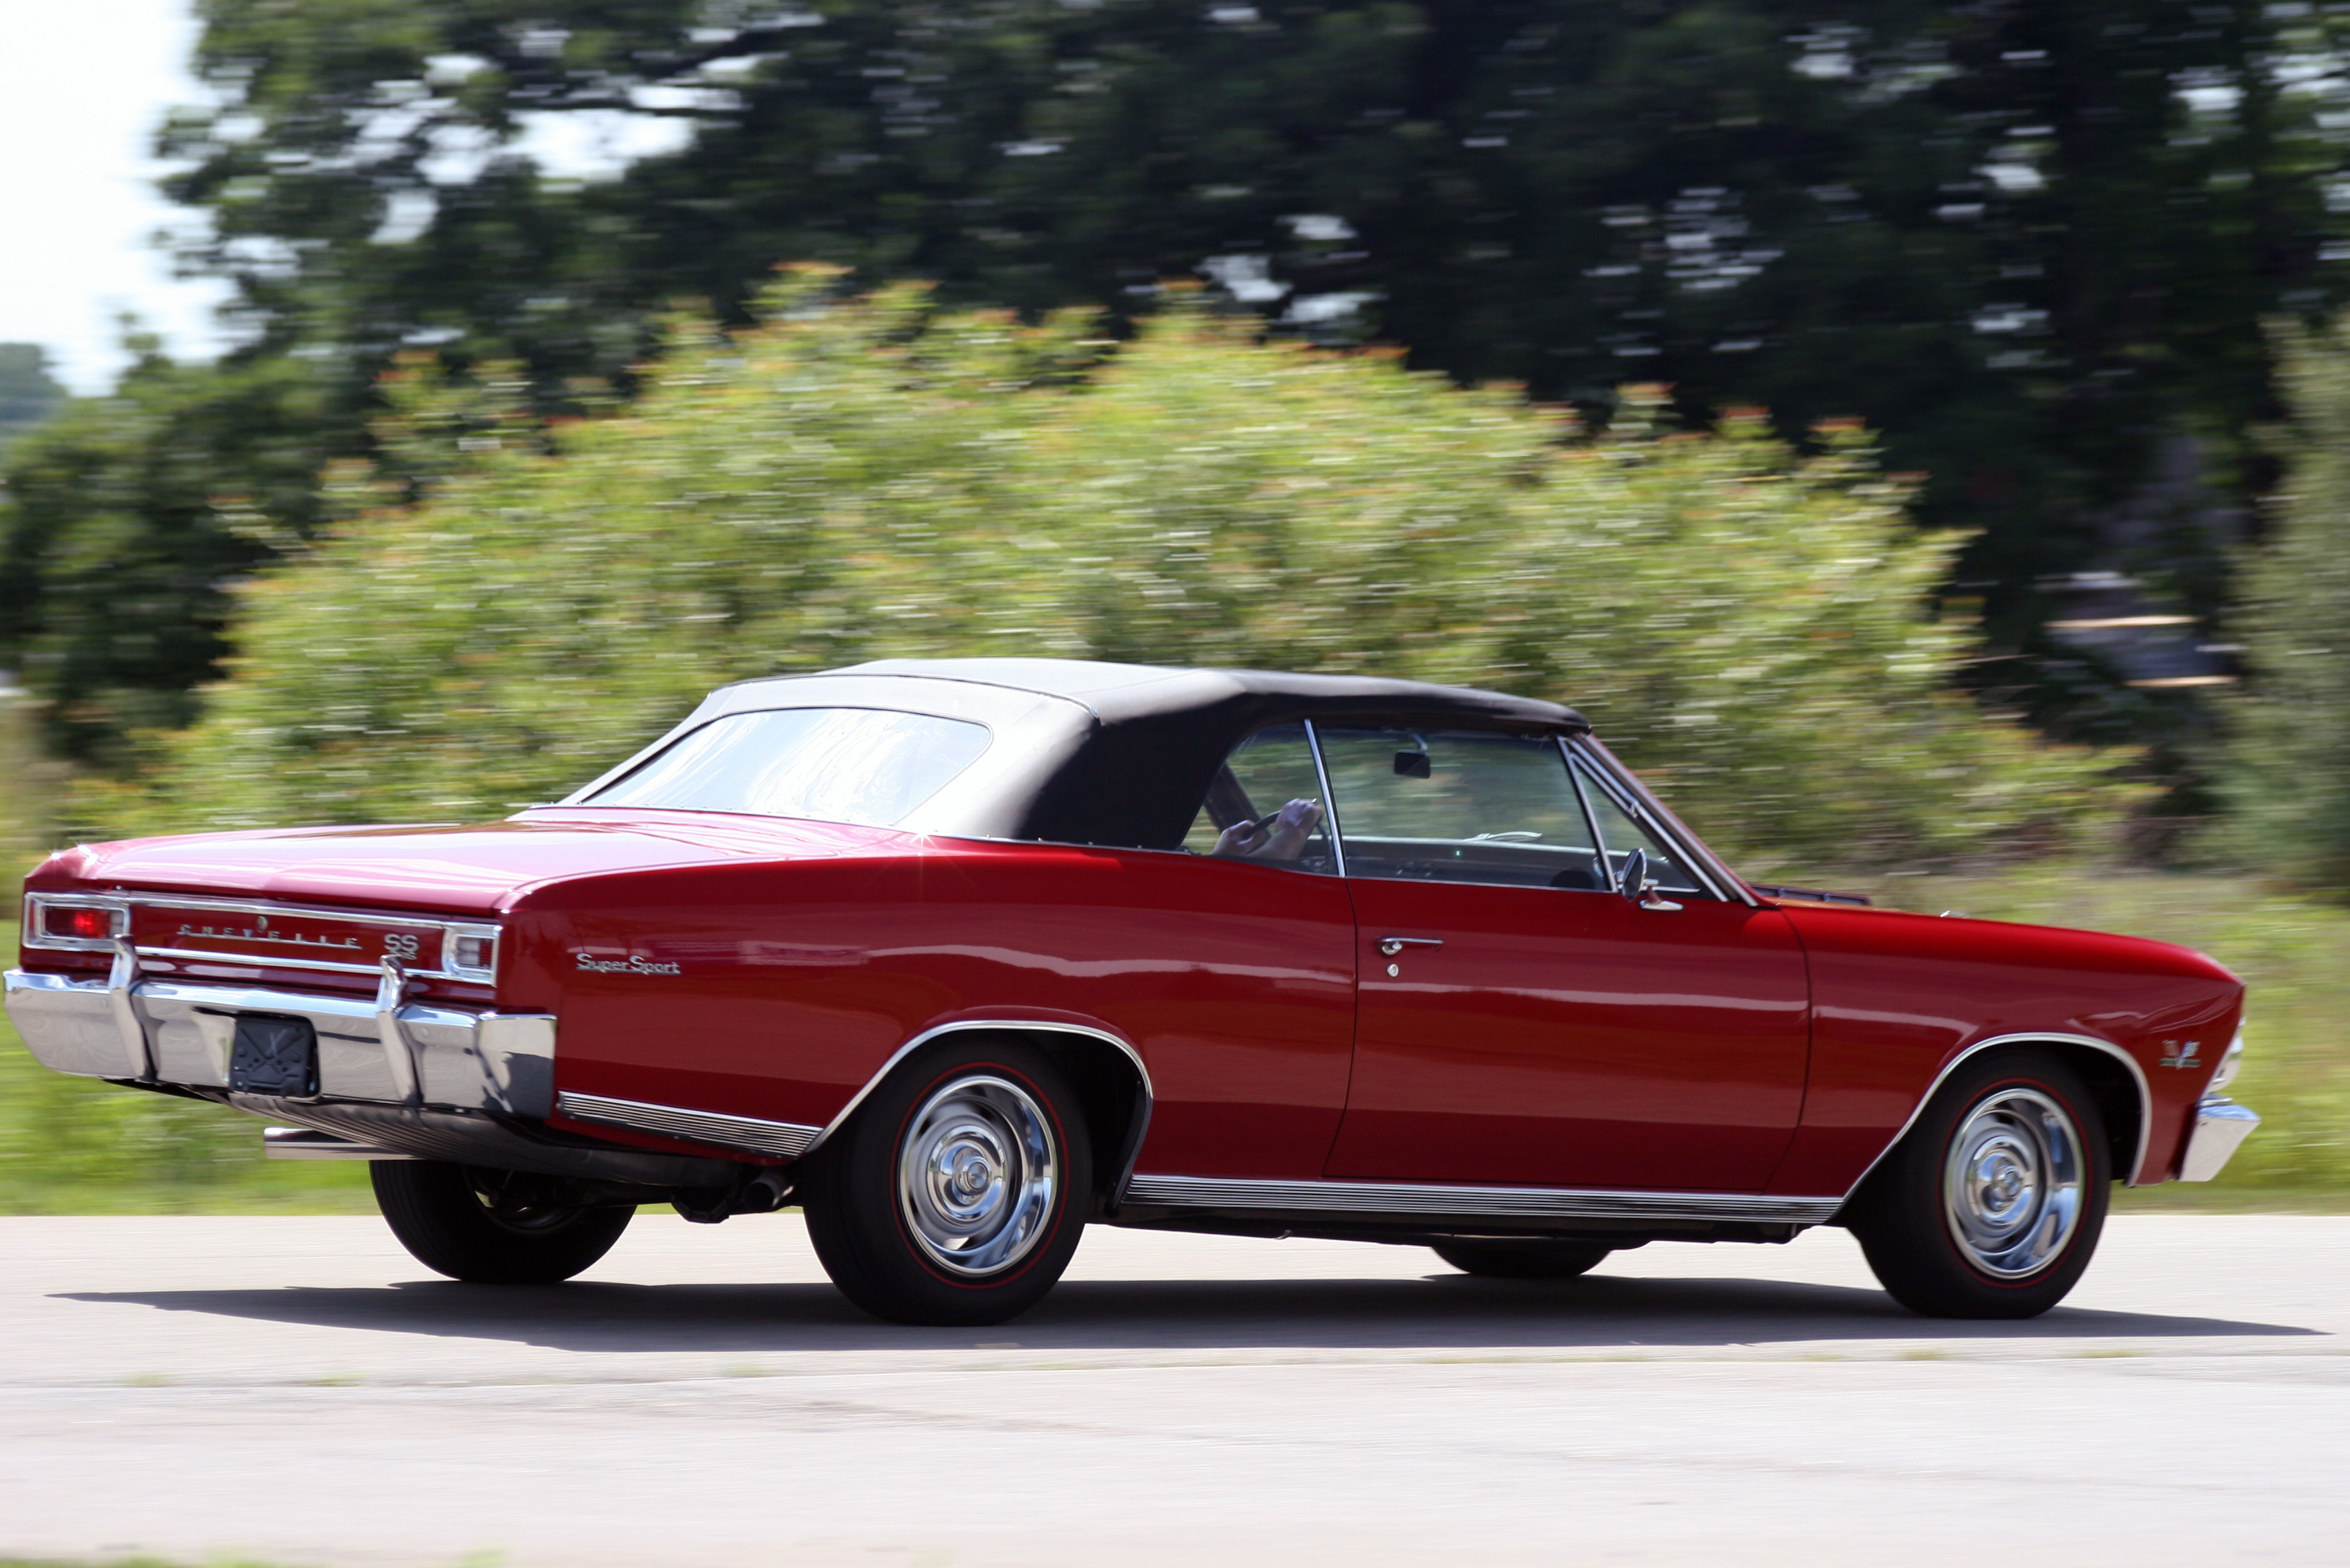 Classic Chevrolet Beaumont >> [49+] 1966 Chevelle Wallpaper on WallpaperSafari